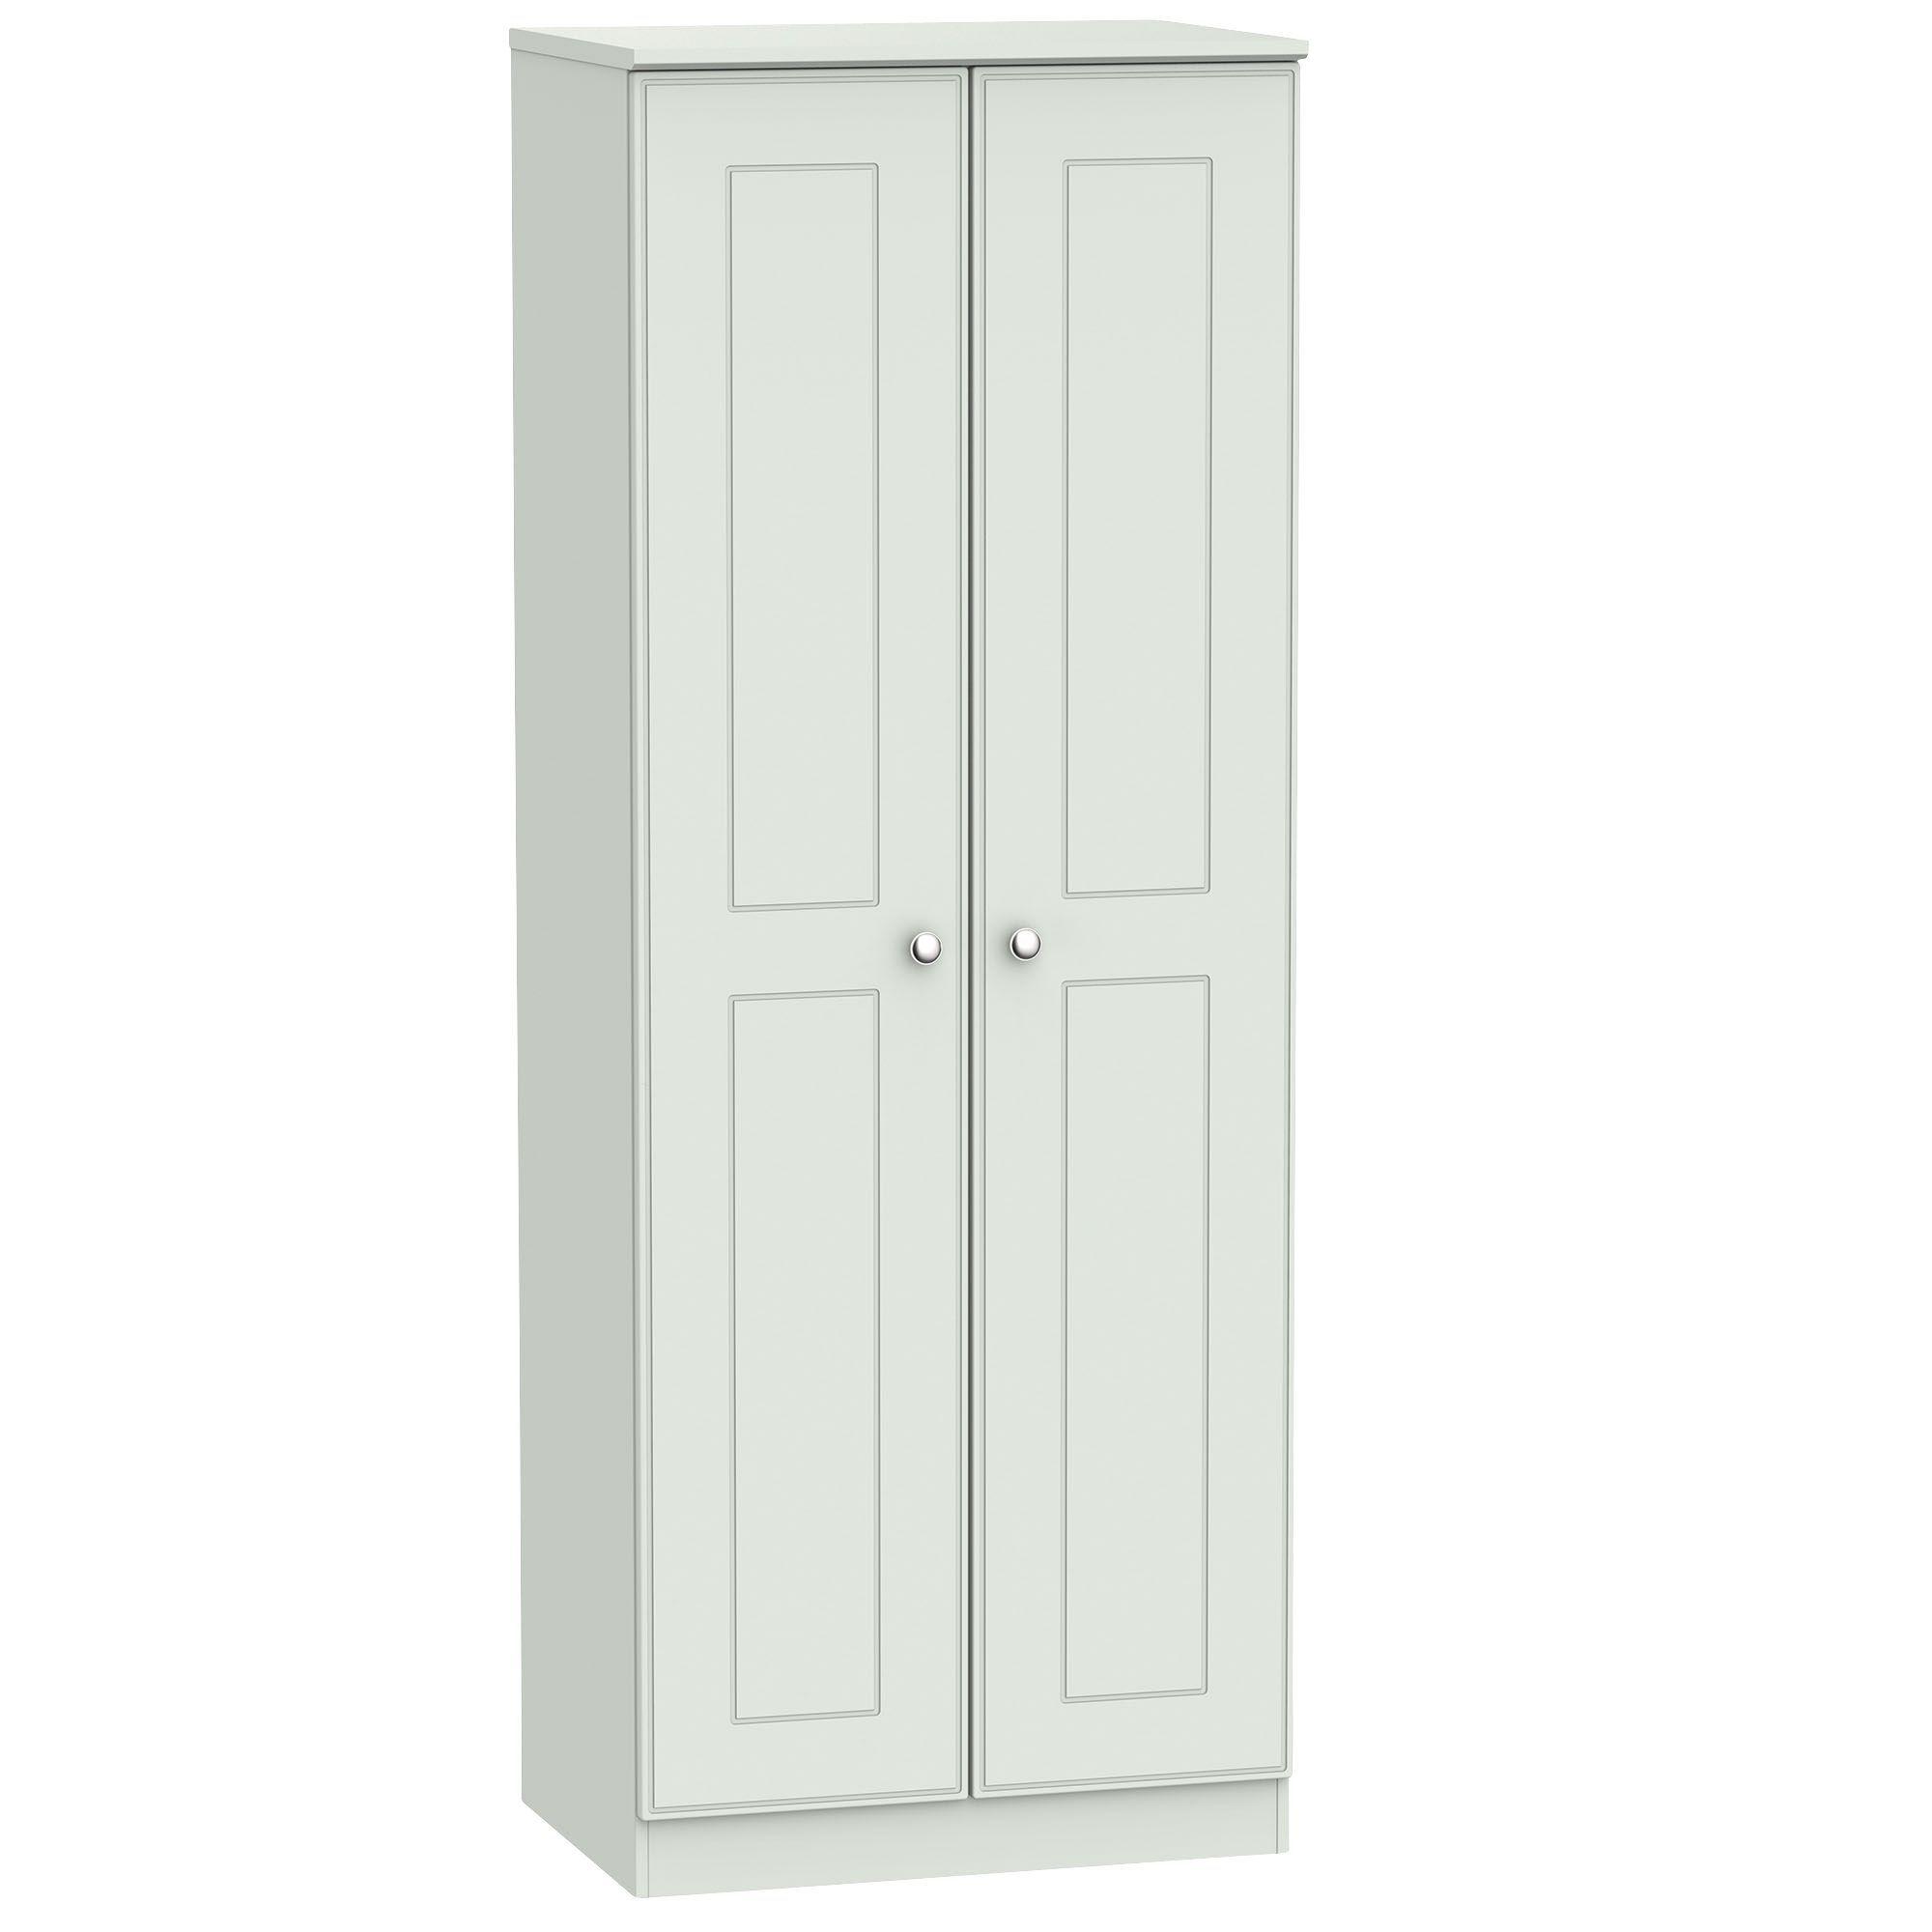 Lugano Grey 2 Door Wardrobe (h)1970mm (w)740mm